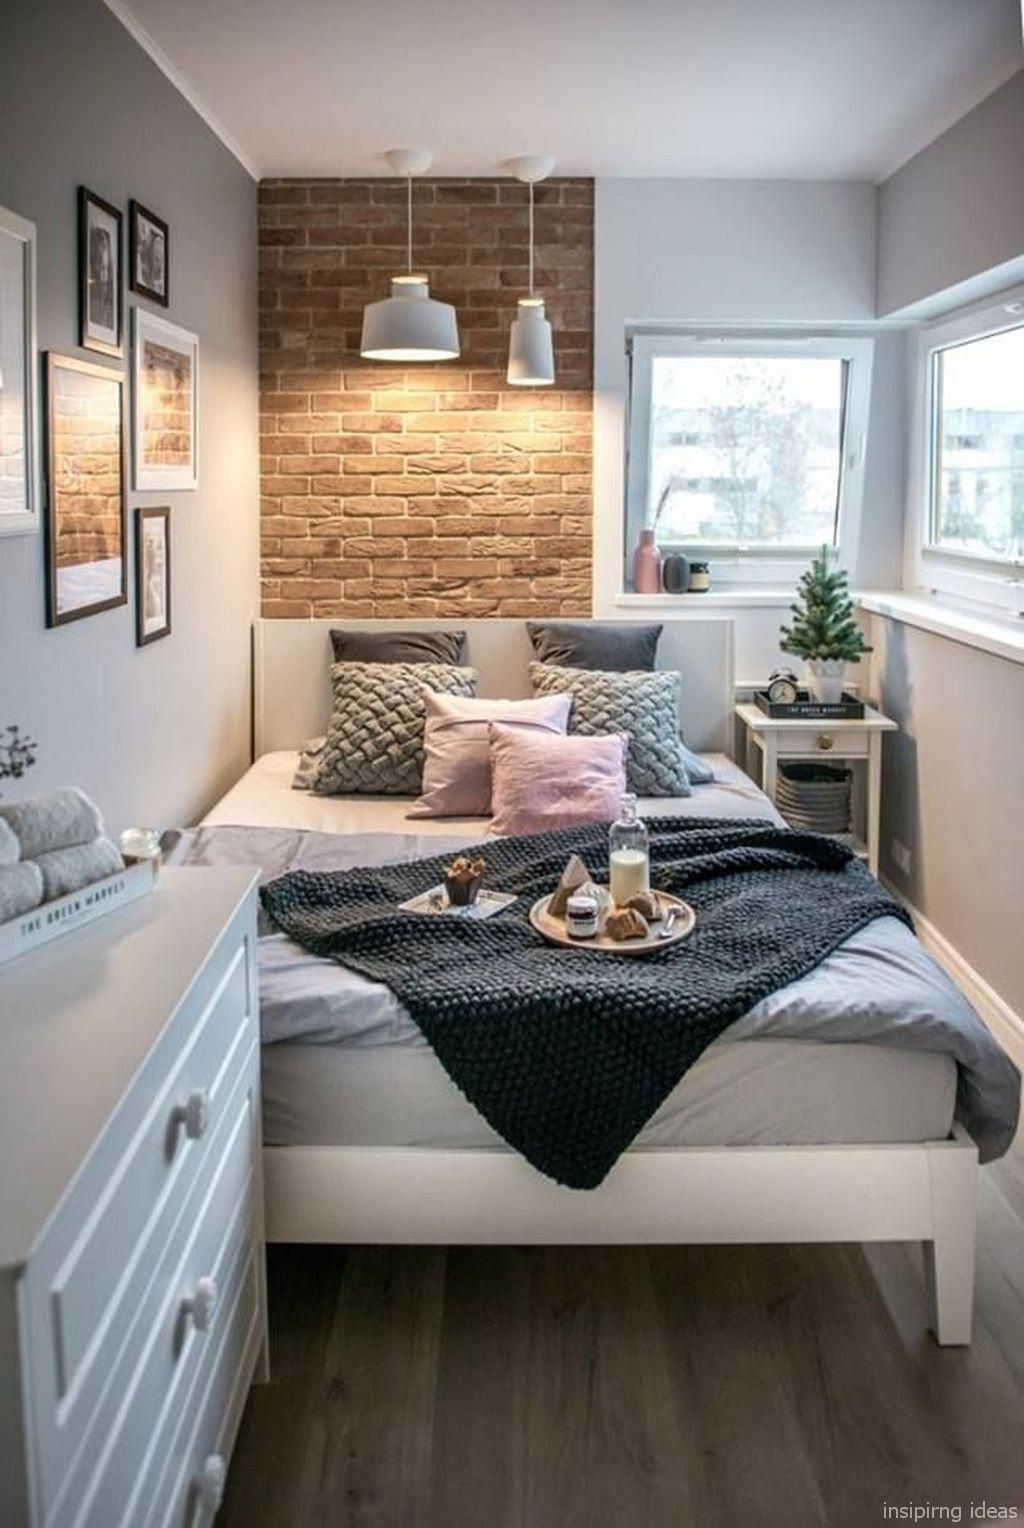 Small Room Design Ikea Smallroomdesign Small Bedroom Small Apartment Bedrooms Small Bedroom Ideas For Couples